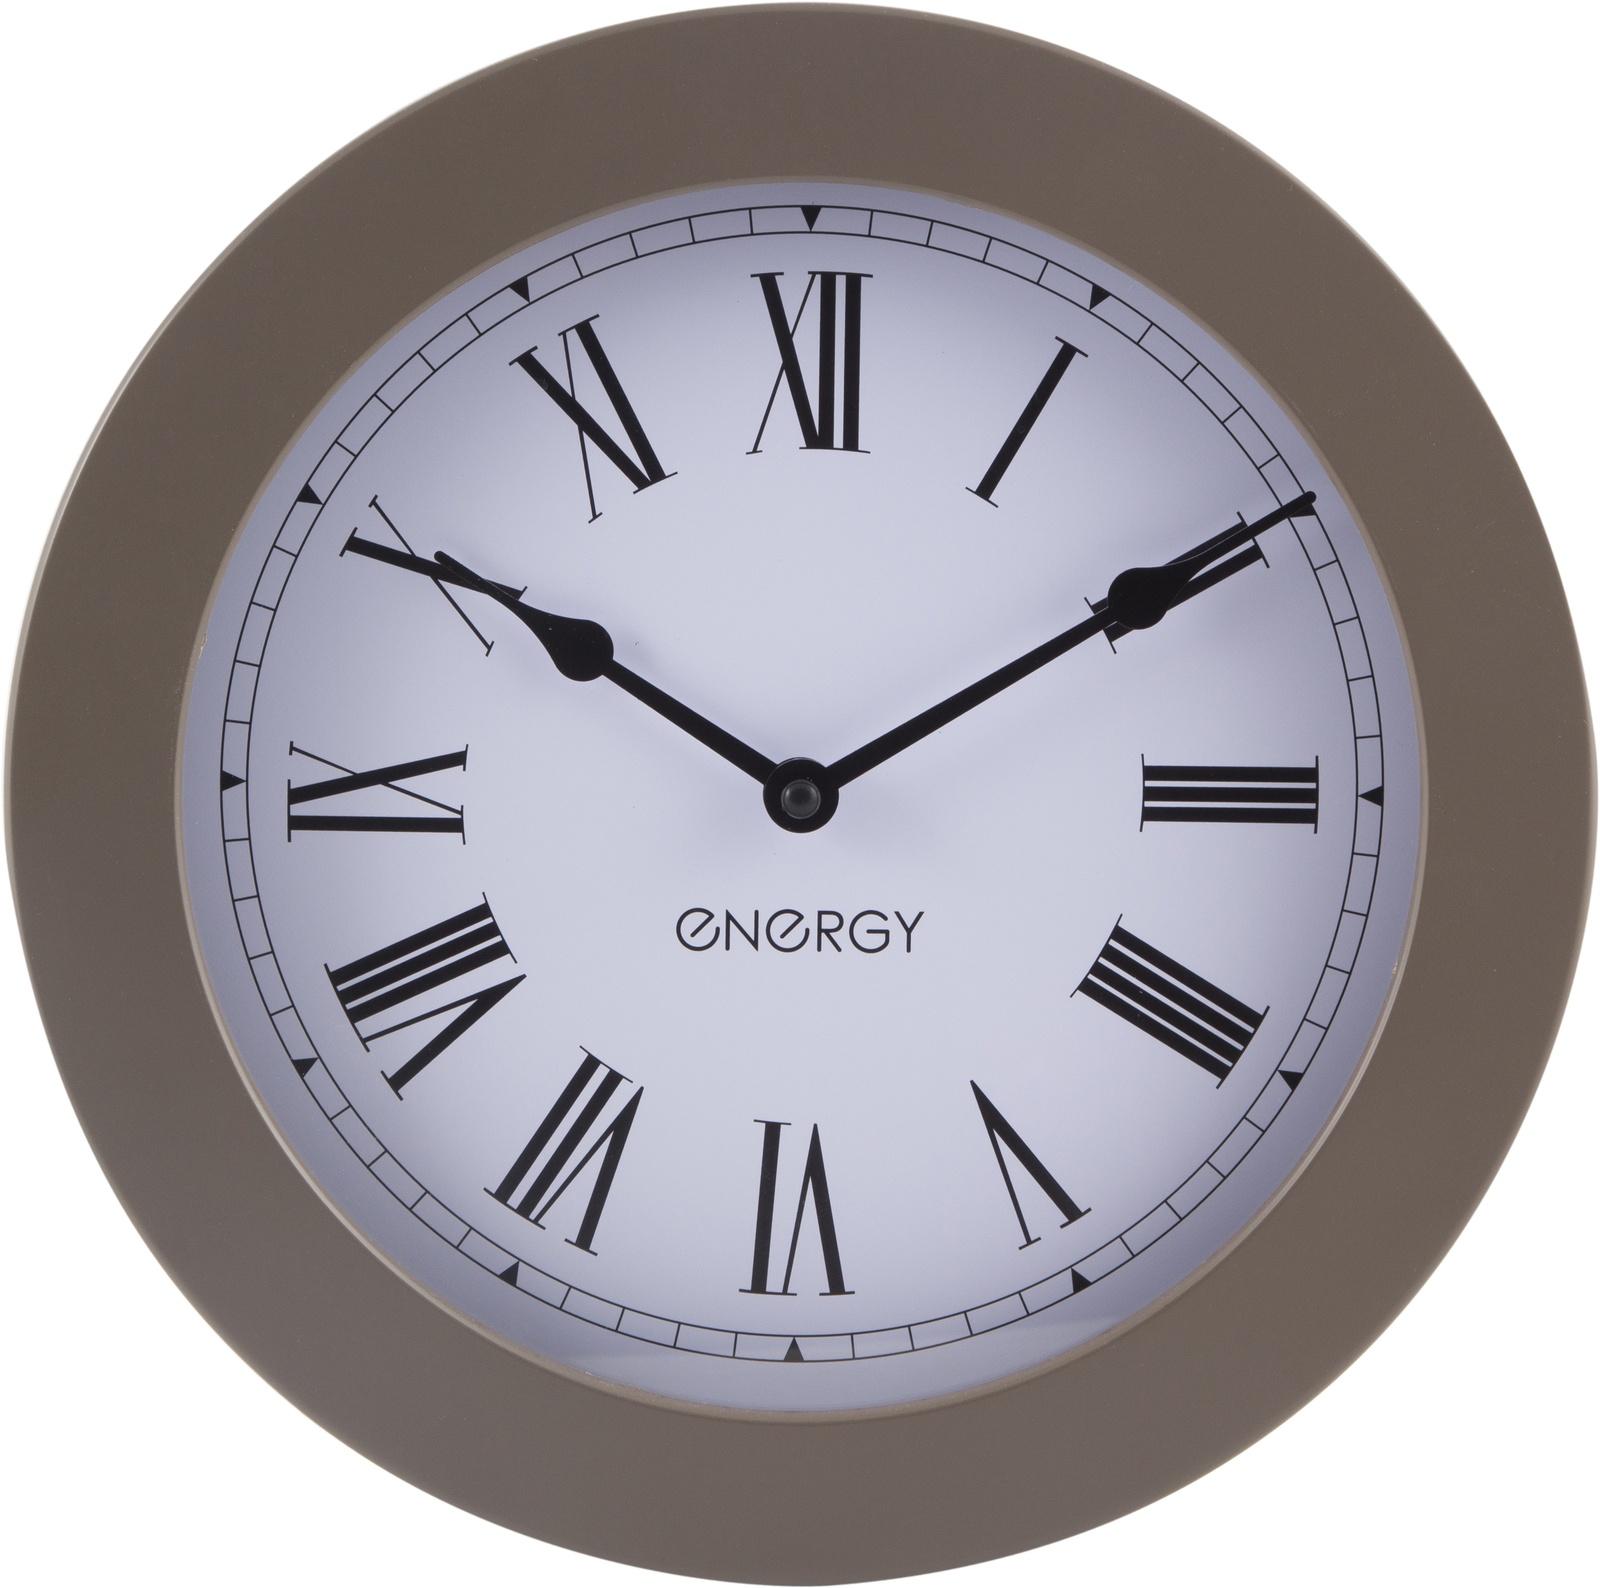 Настенные часы Energy ЕС-114, круглые, золото цена 2017